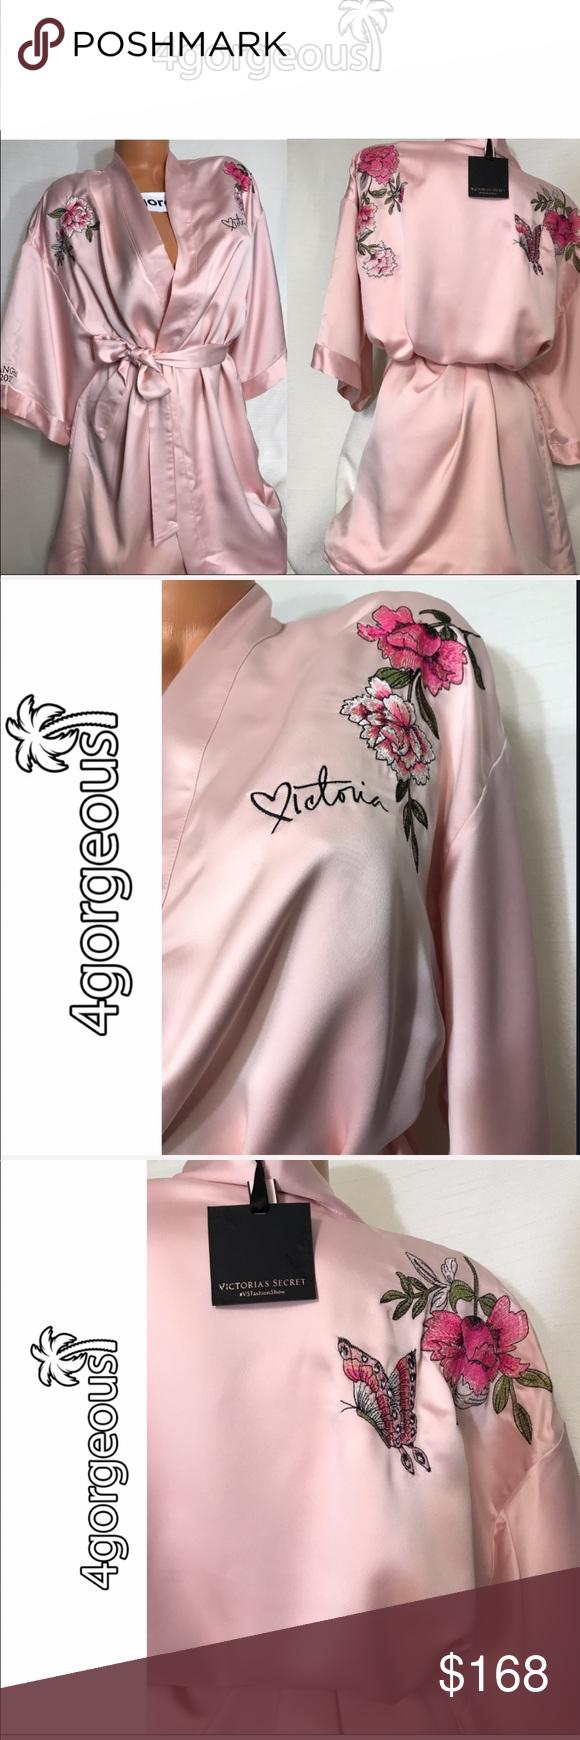 06a2b9e300 Victoria s Secret · Runway Fashion · Needlework · Needlepoint · VS M L